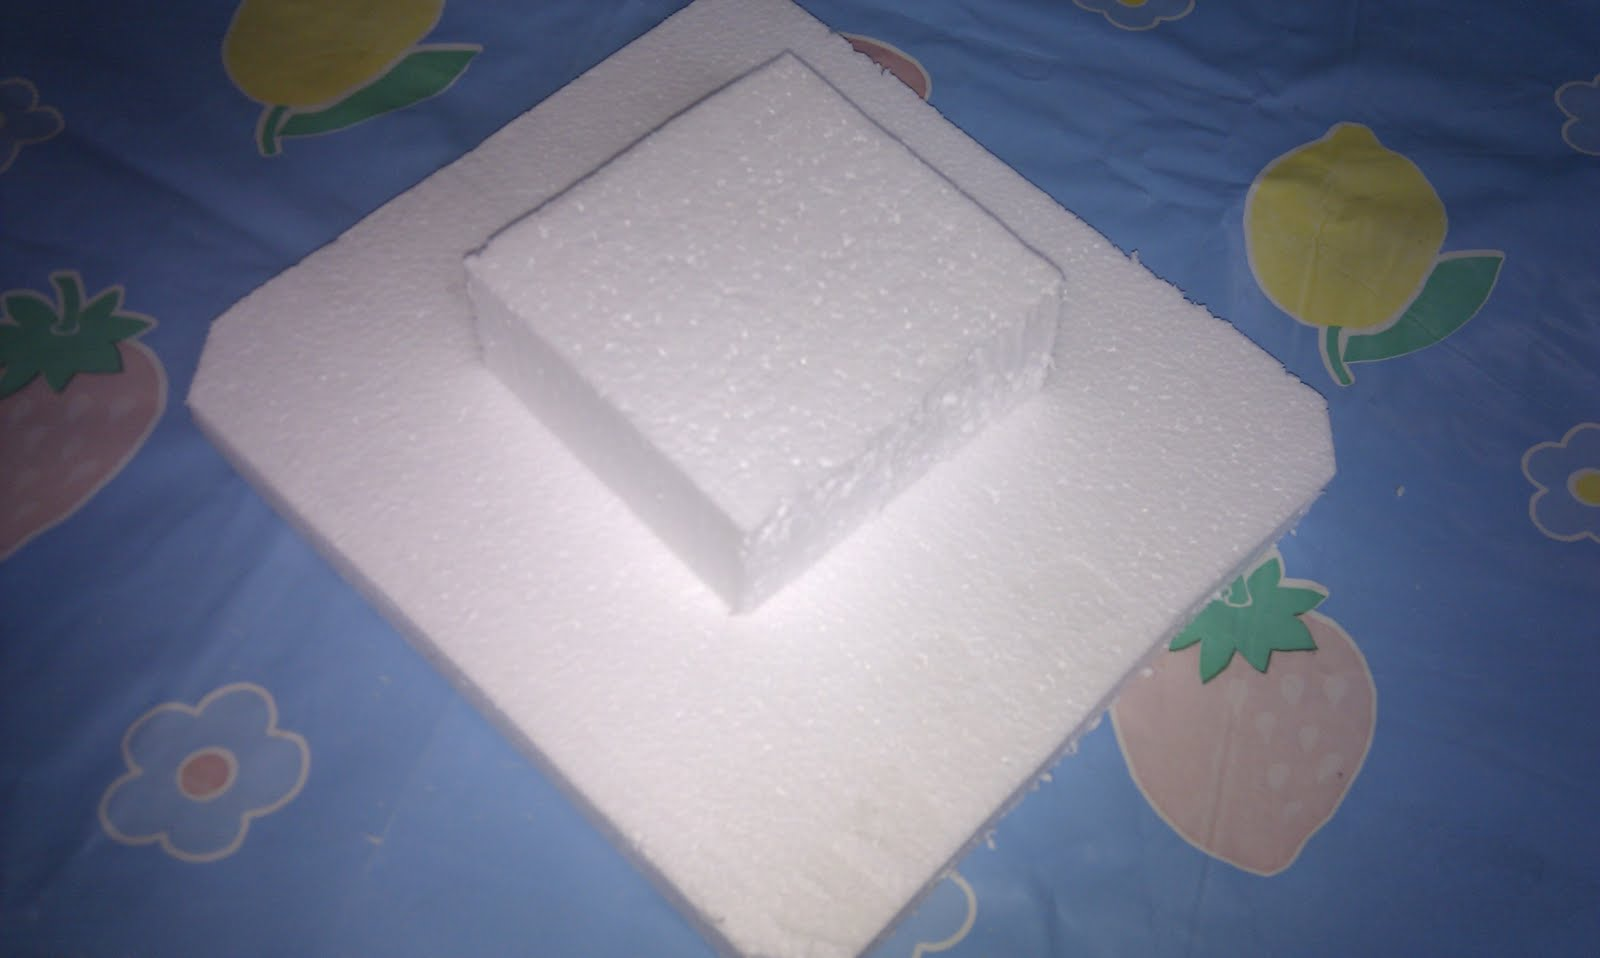 Rosana y silvia manualidades y pasteles paso a paso tarta de chuches - Manualidades corcho blanco ...